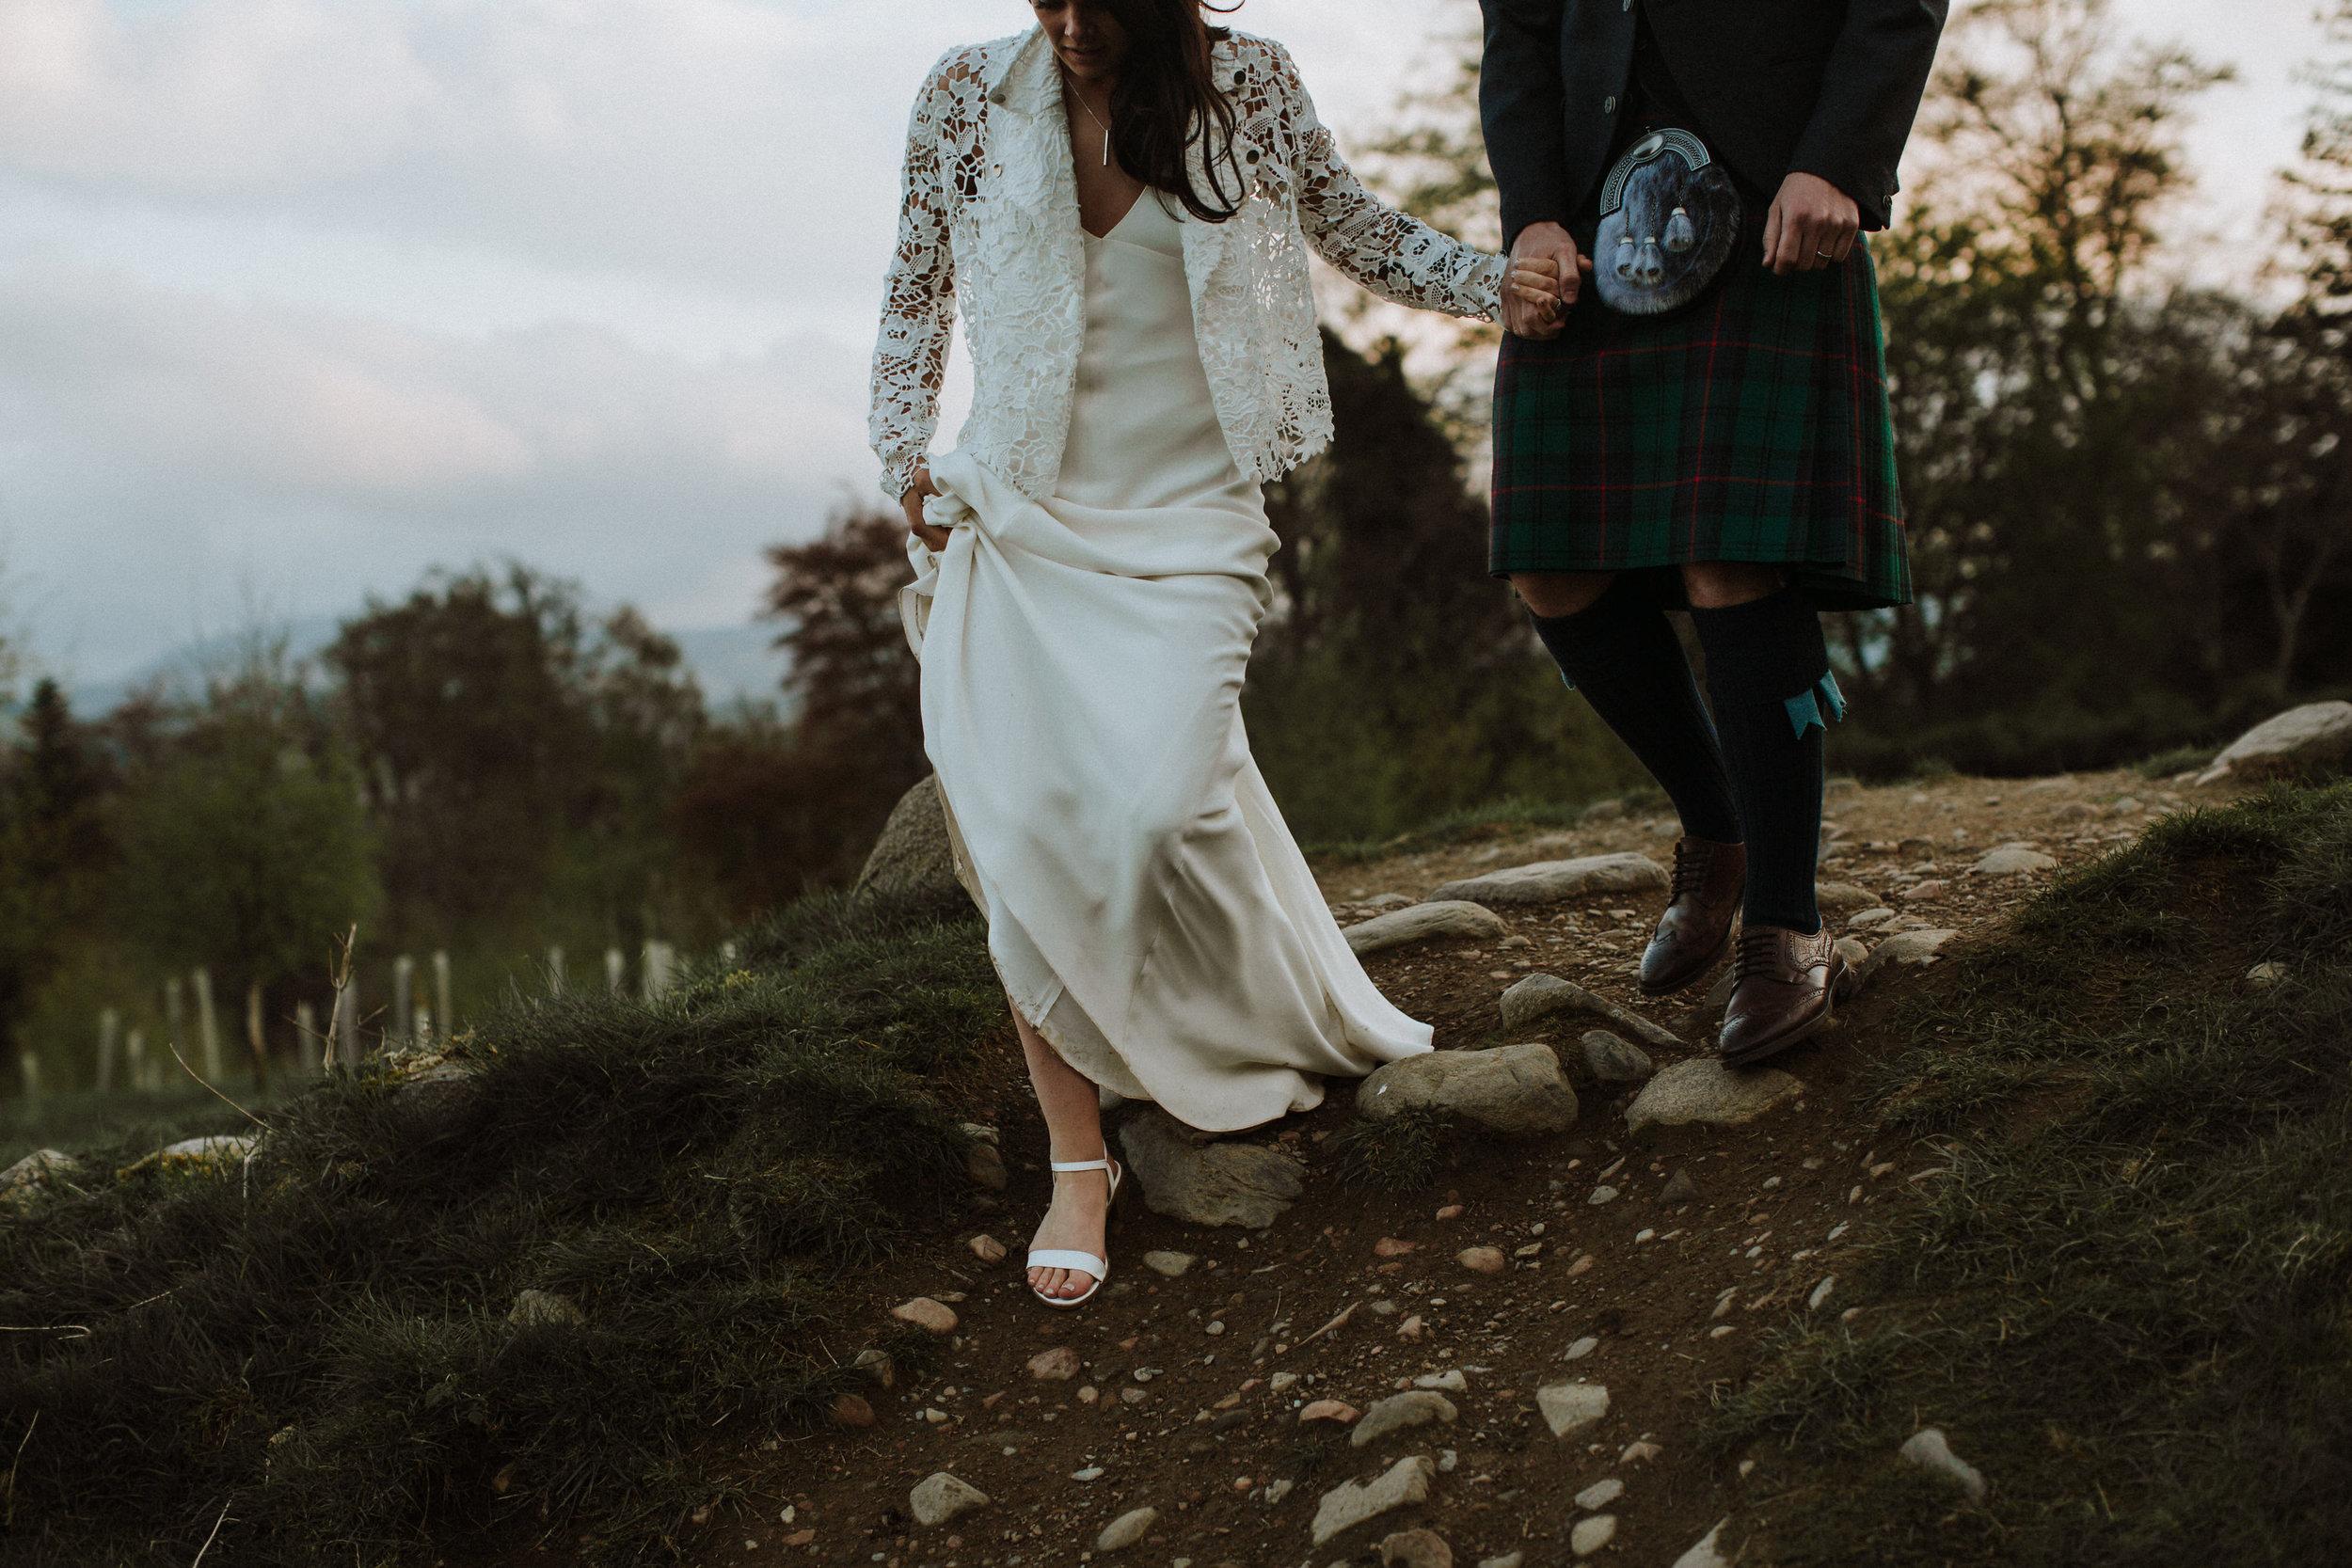 Katt-Scotland-Comrie-Crieff-Bias-Crepe-Wedding-Gown-Lace-Bridal-Biker-Jacket-Bespoke-Susanna-Greening-Derbyshire-1